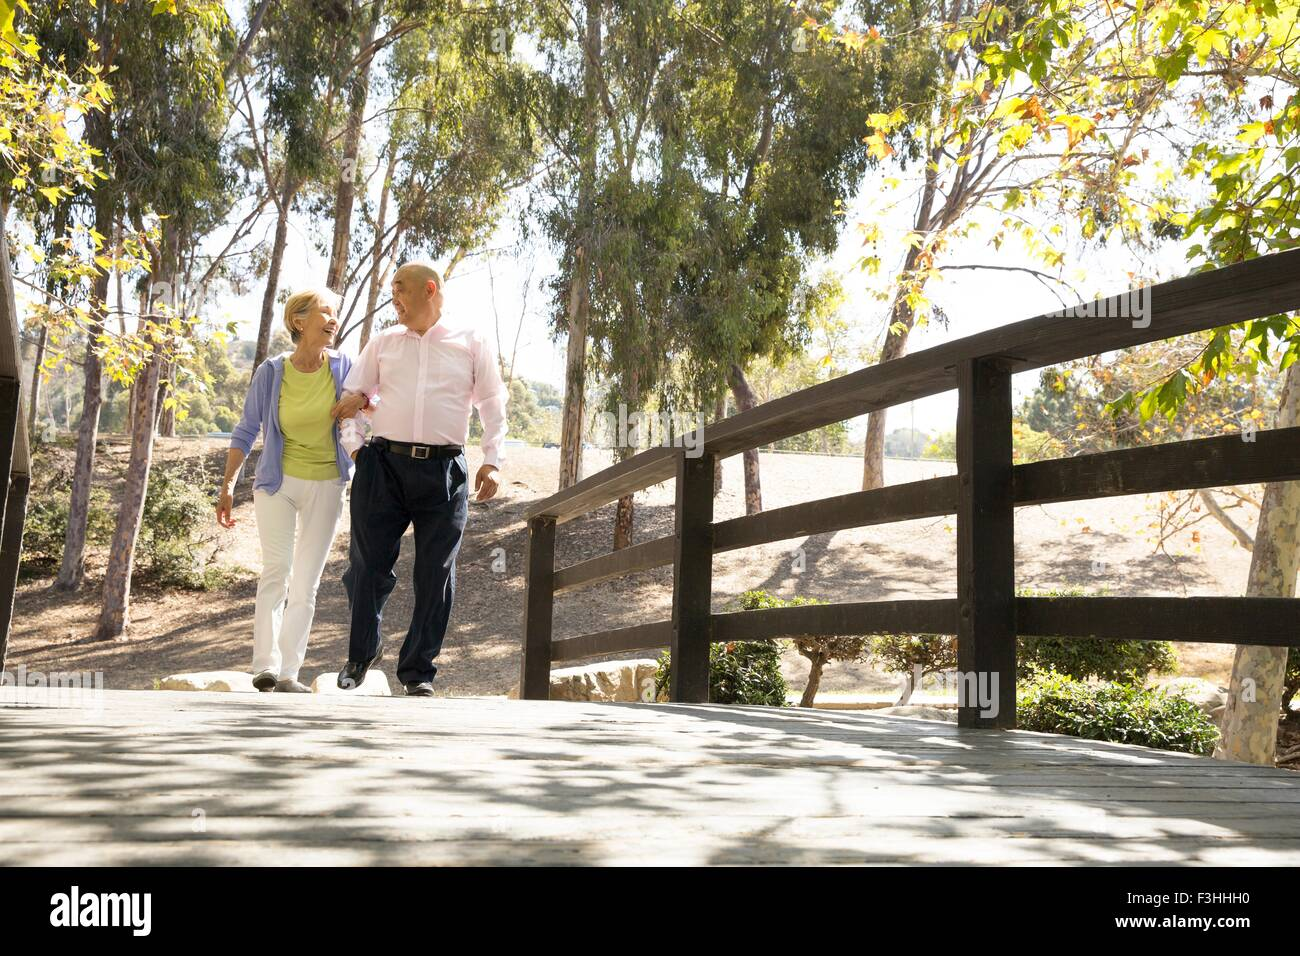 Senior couple walking arm in arm across footbridge - Stock Image